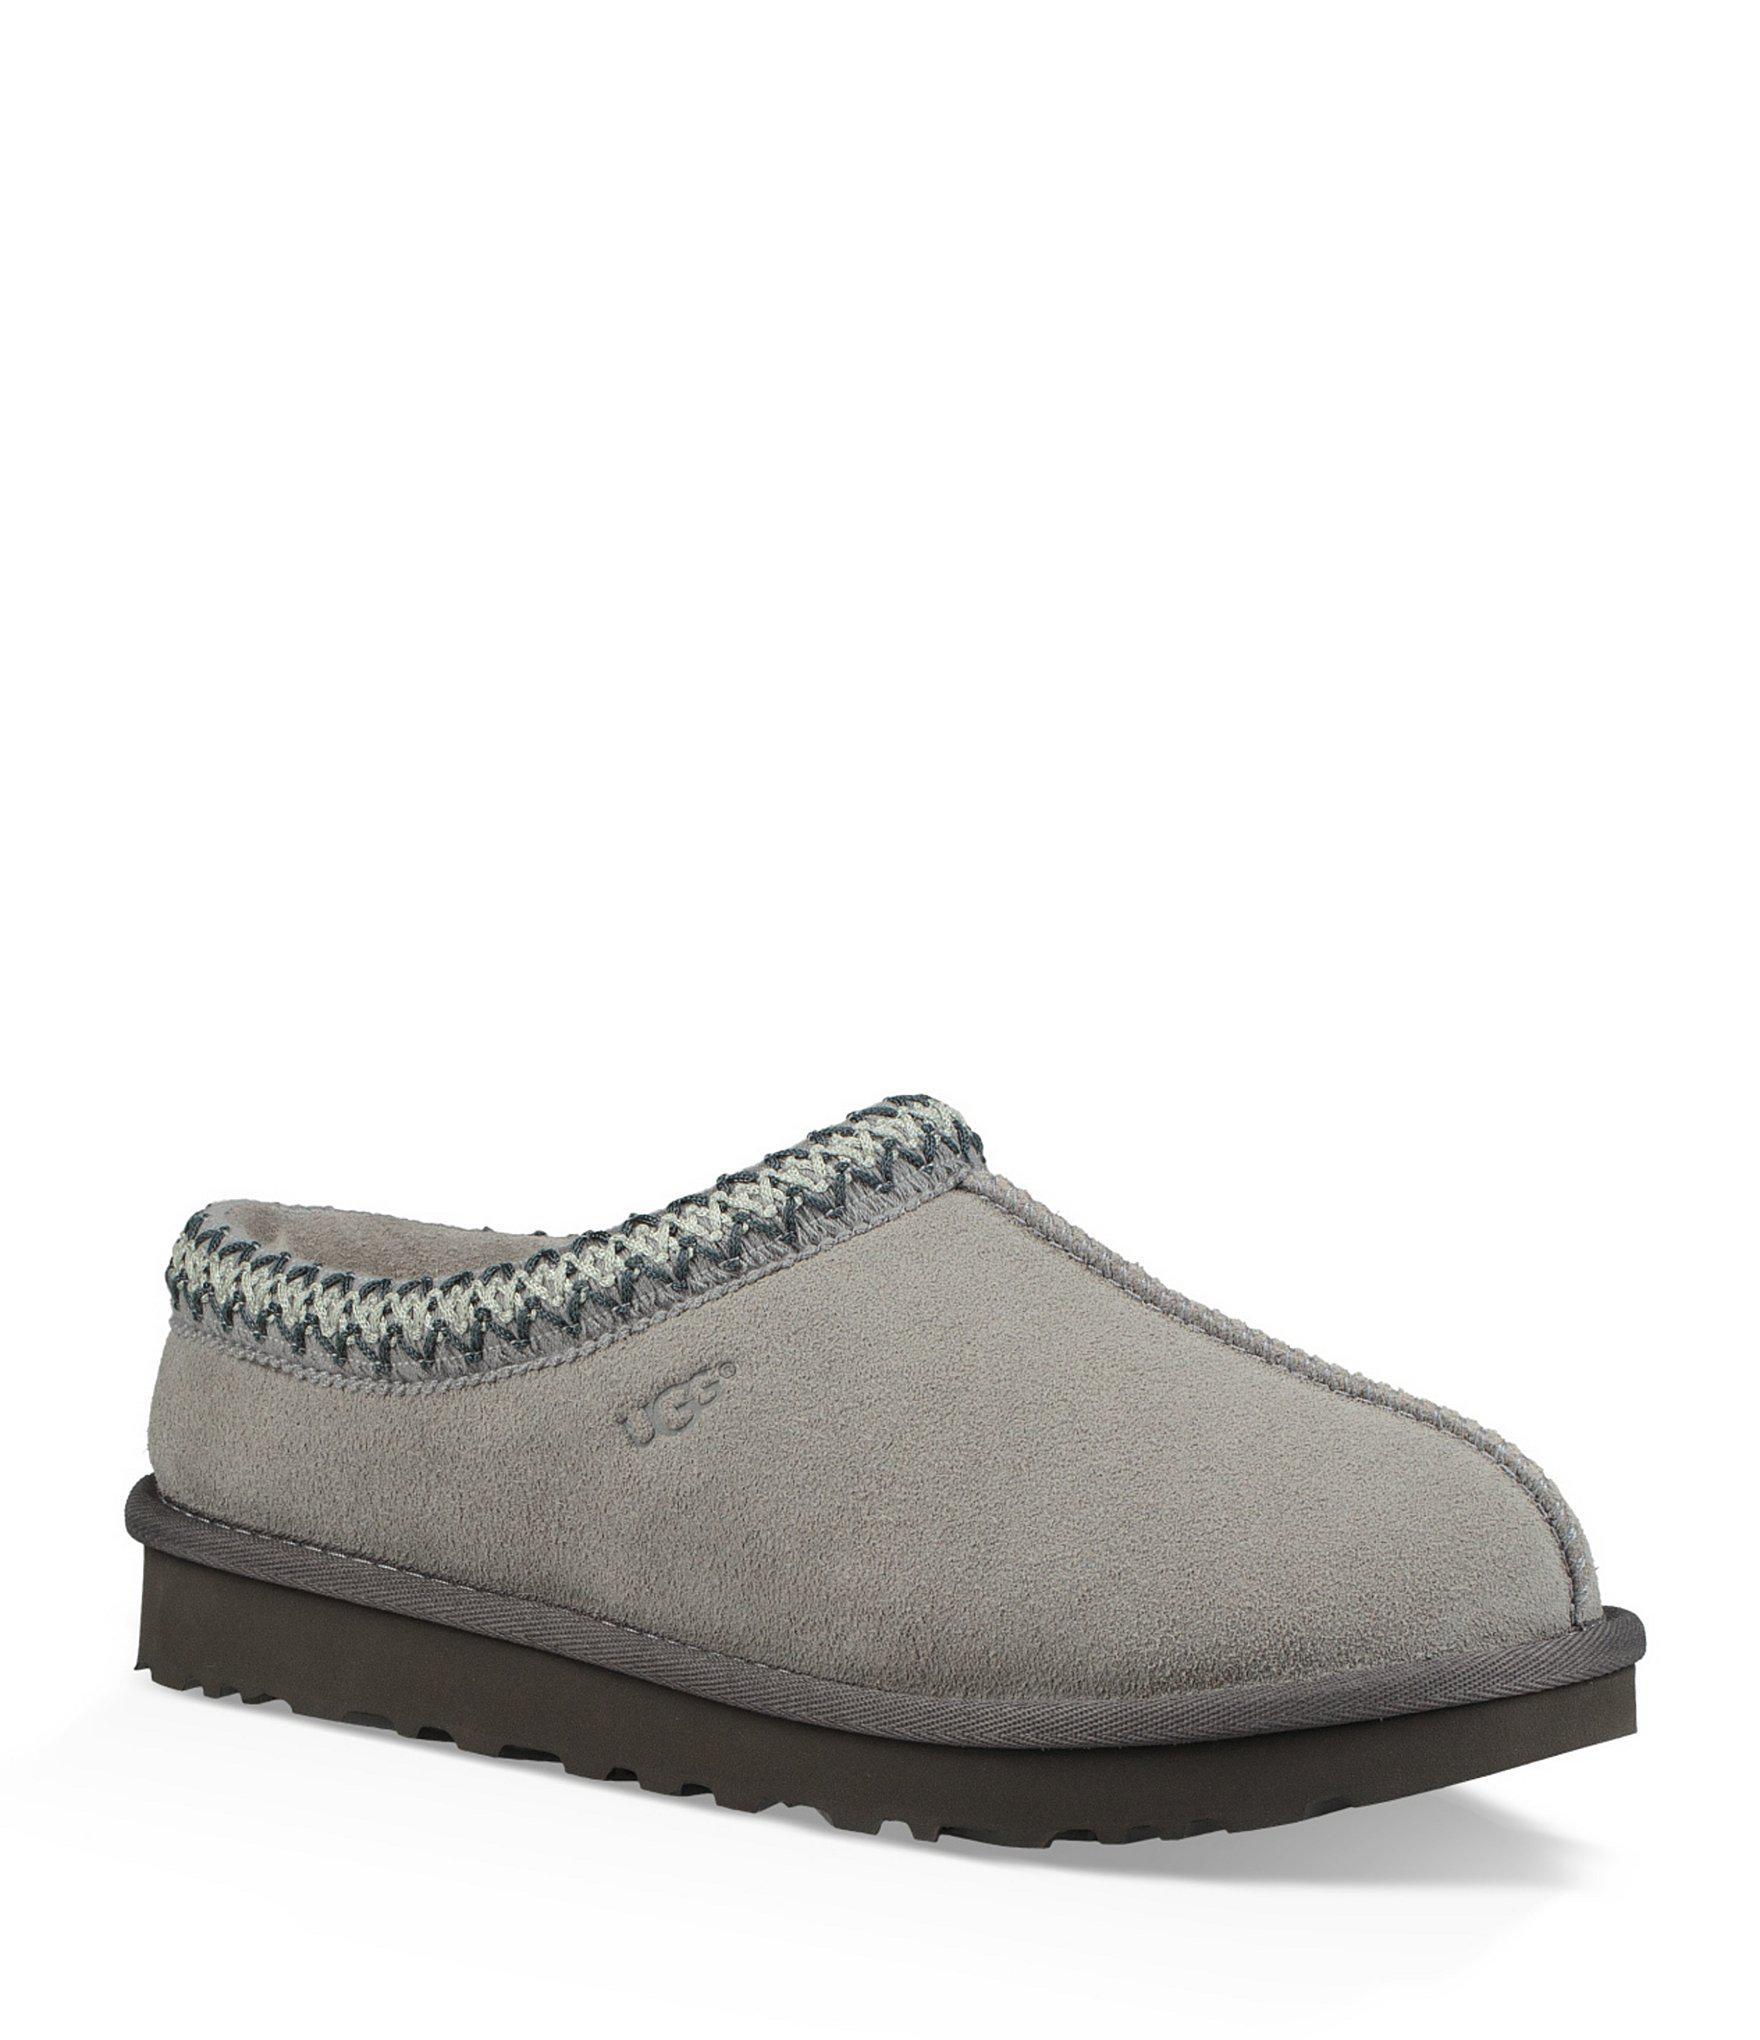 47951be285c Lyst - UGG Women s Tasman Slippers in Gray